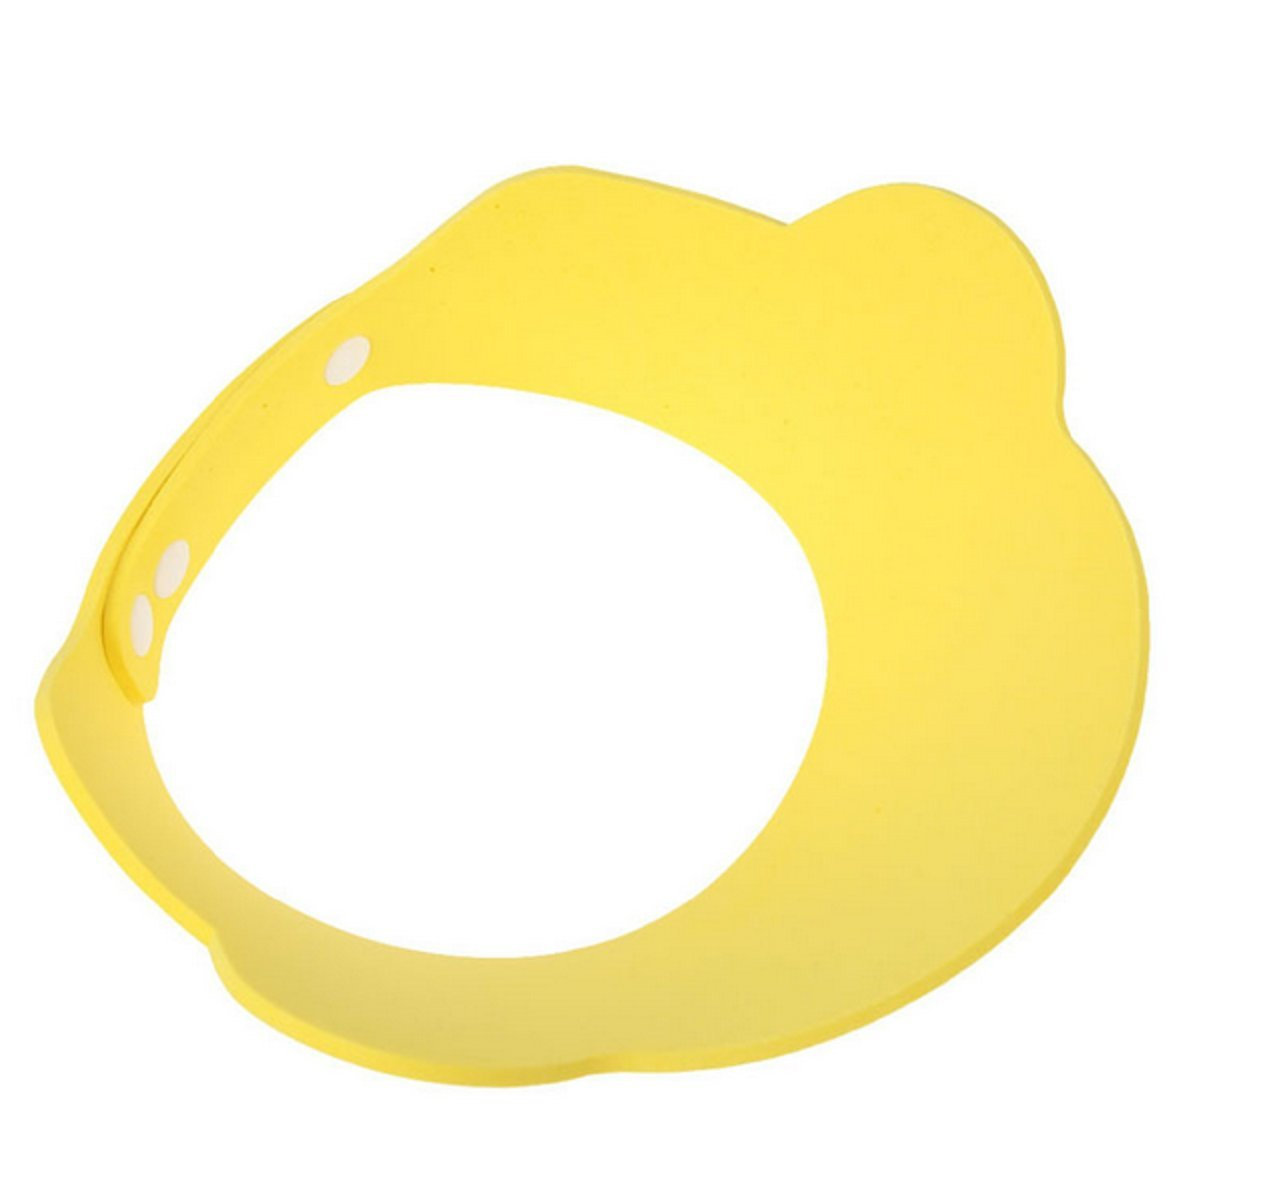 Colorido Idea de regalo Protecci/ón para los ojos C/ómodo Ni/ños Gorro de ducha Suave O/ídos Ba/ño Modelo 3 Azul Ajustable